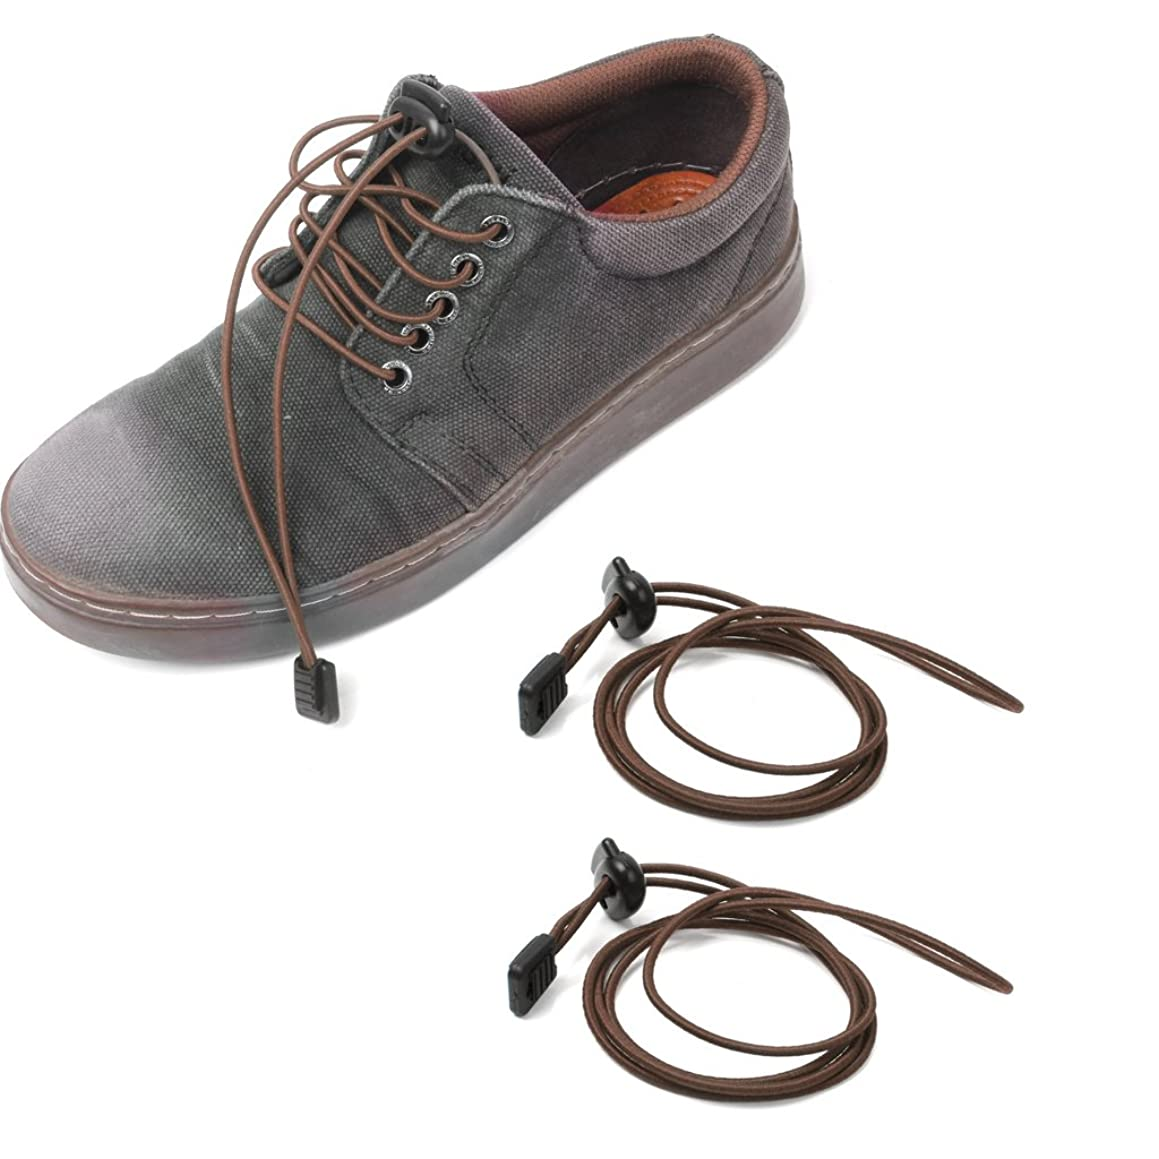 Prettyia Locking Shoe Laces String Elastic Fasten Trainers Running Marat - Brown